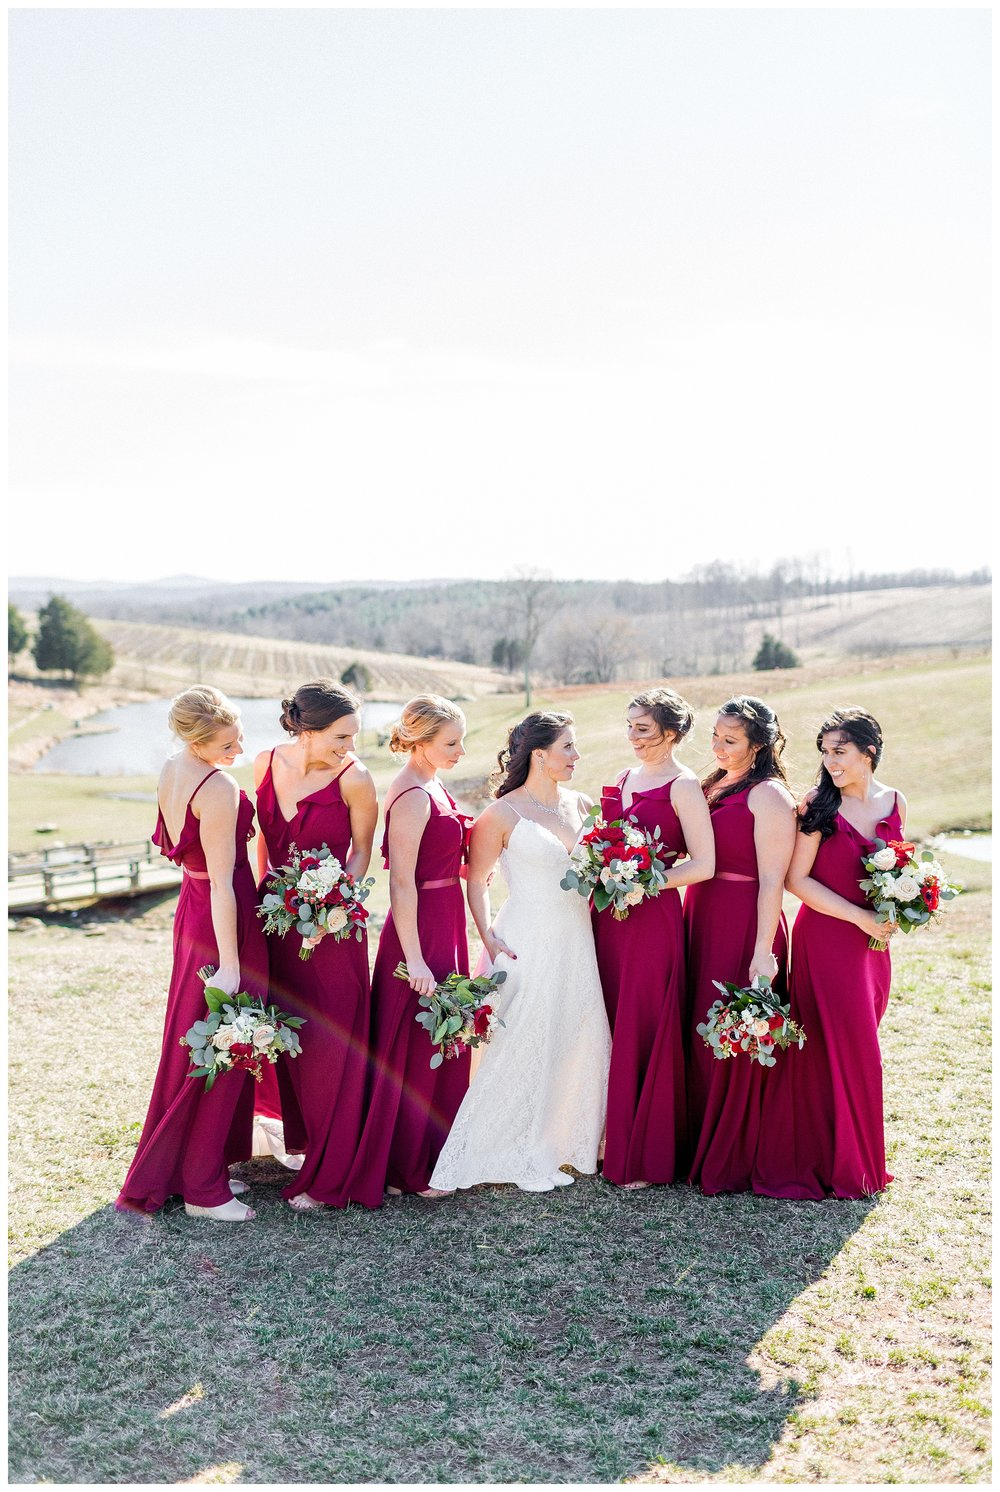 Stone Tower Winery Wedding | Virginia Winter Wedding | VA Wedding Photographer Kir Tuben_0078.jpg